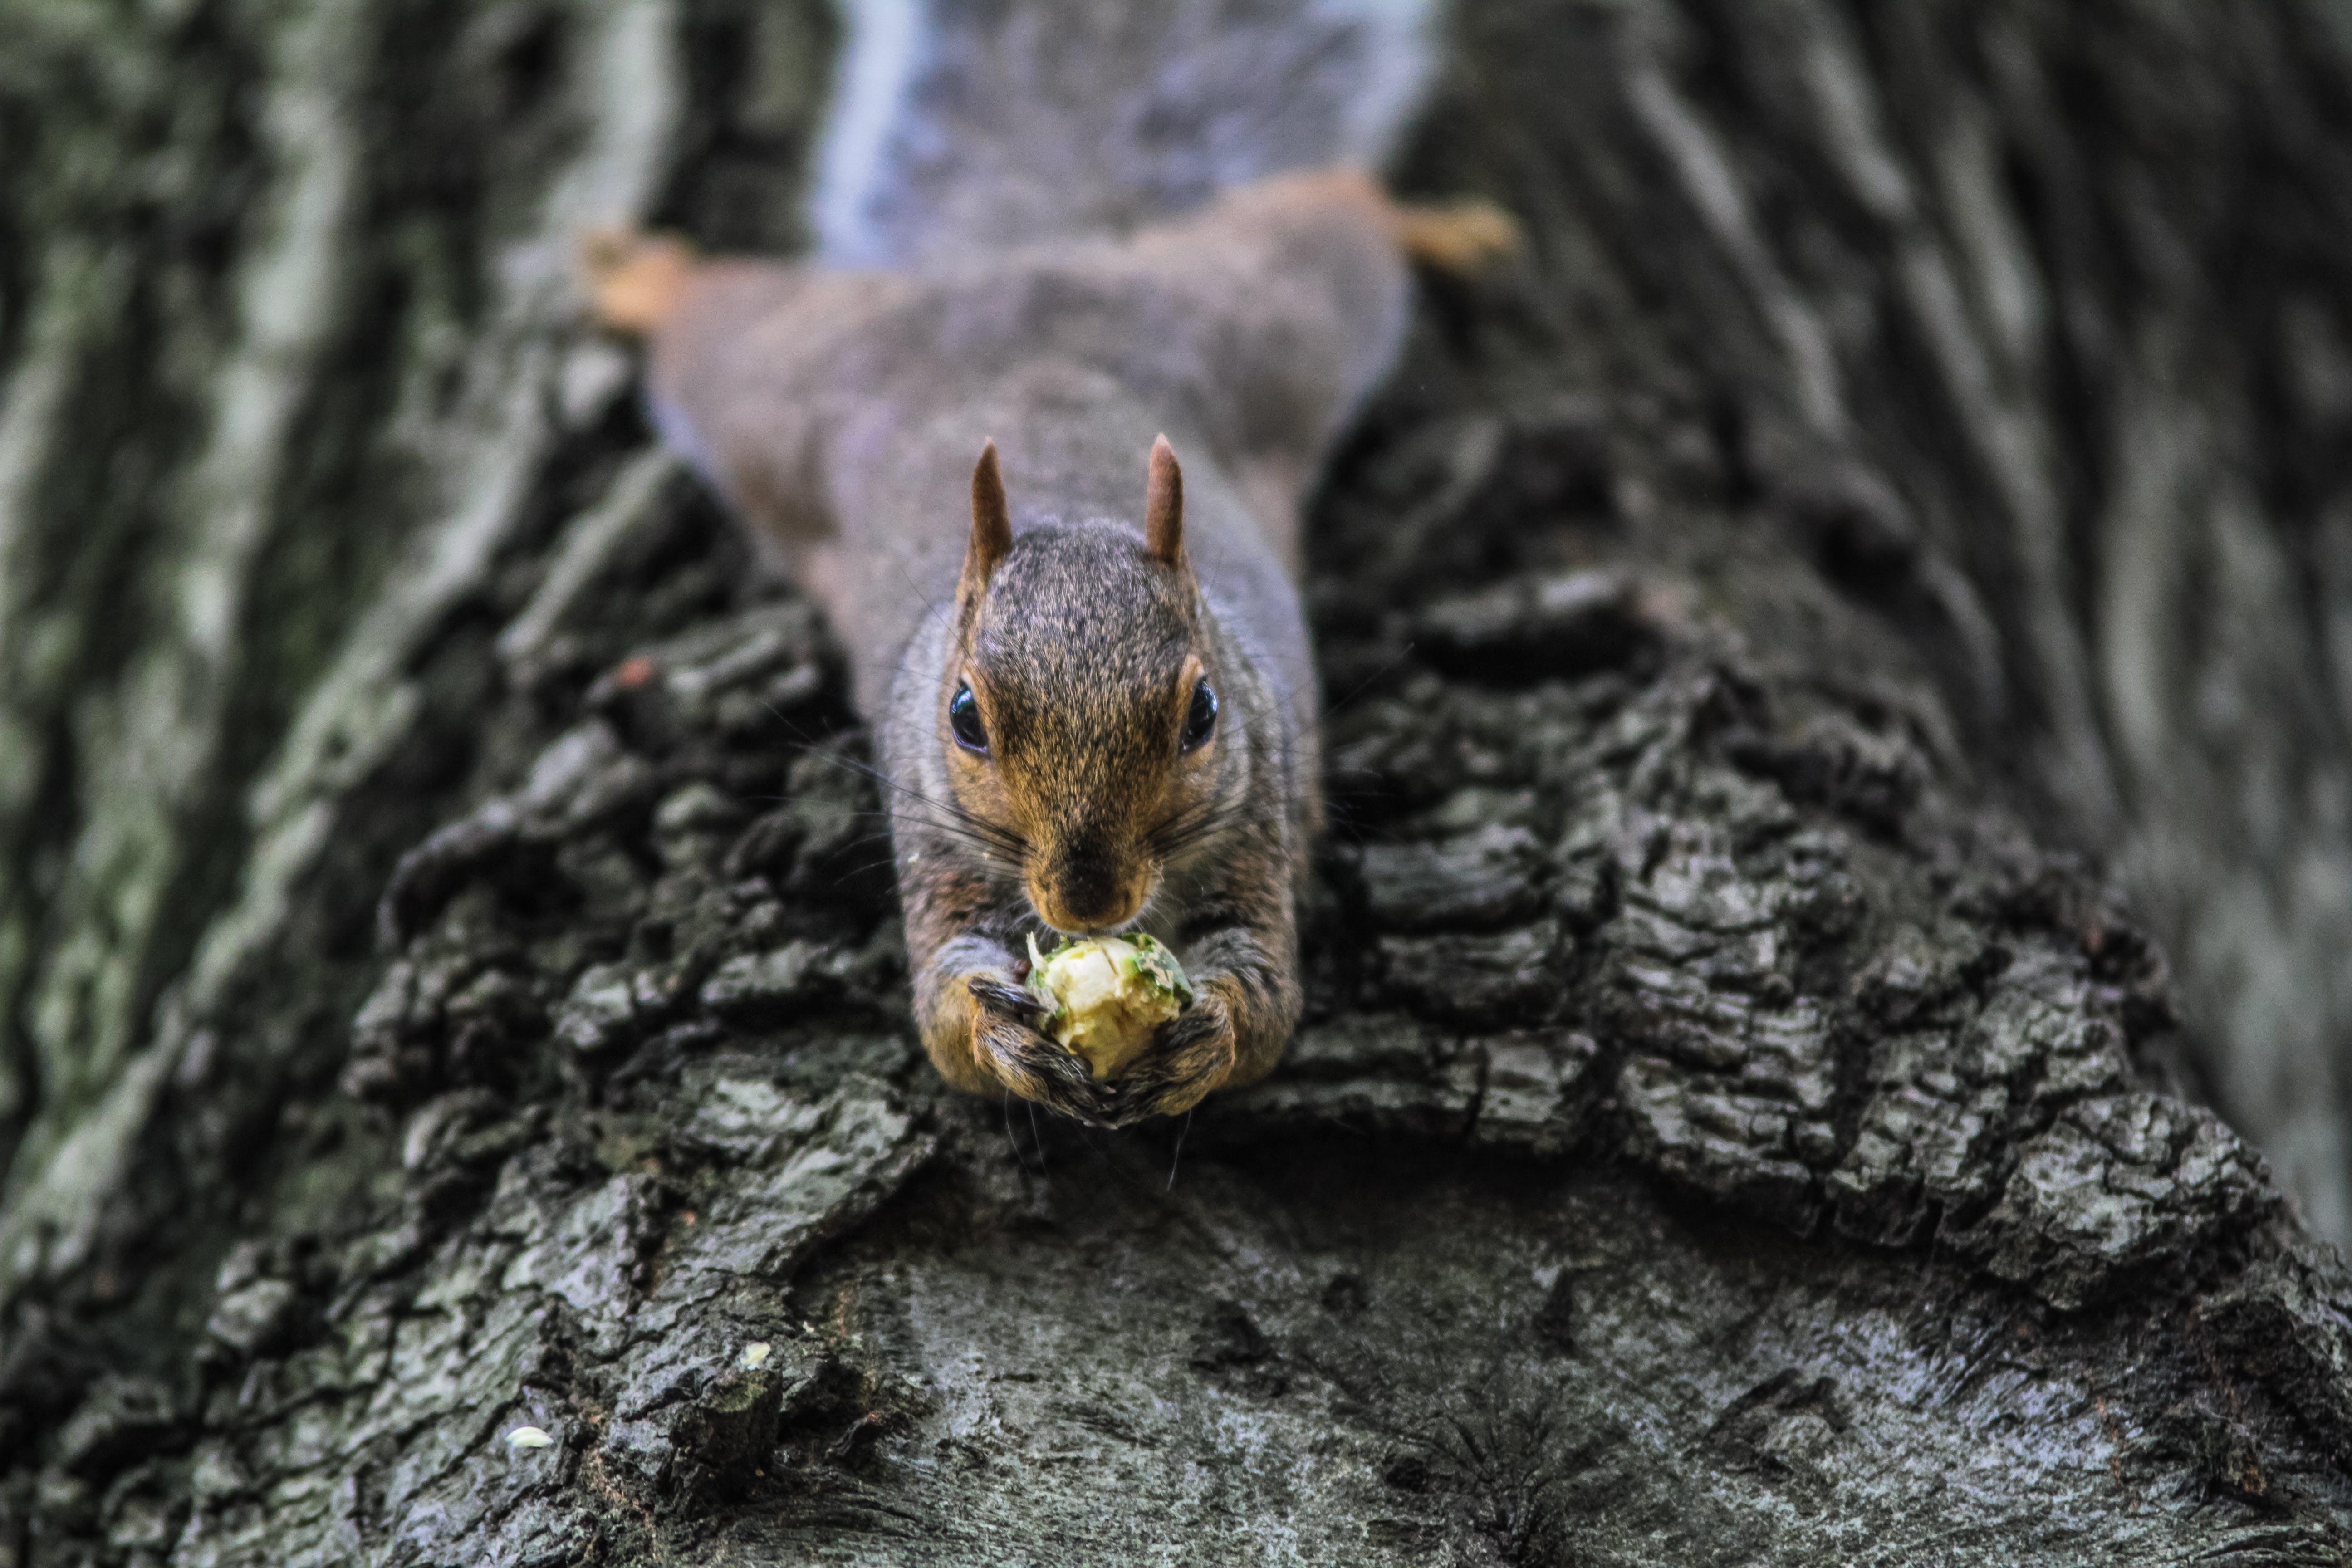 animal, animal photography, cute